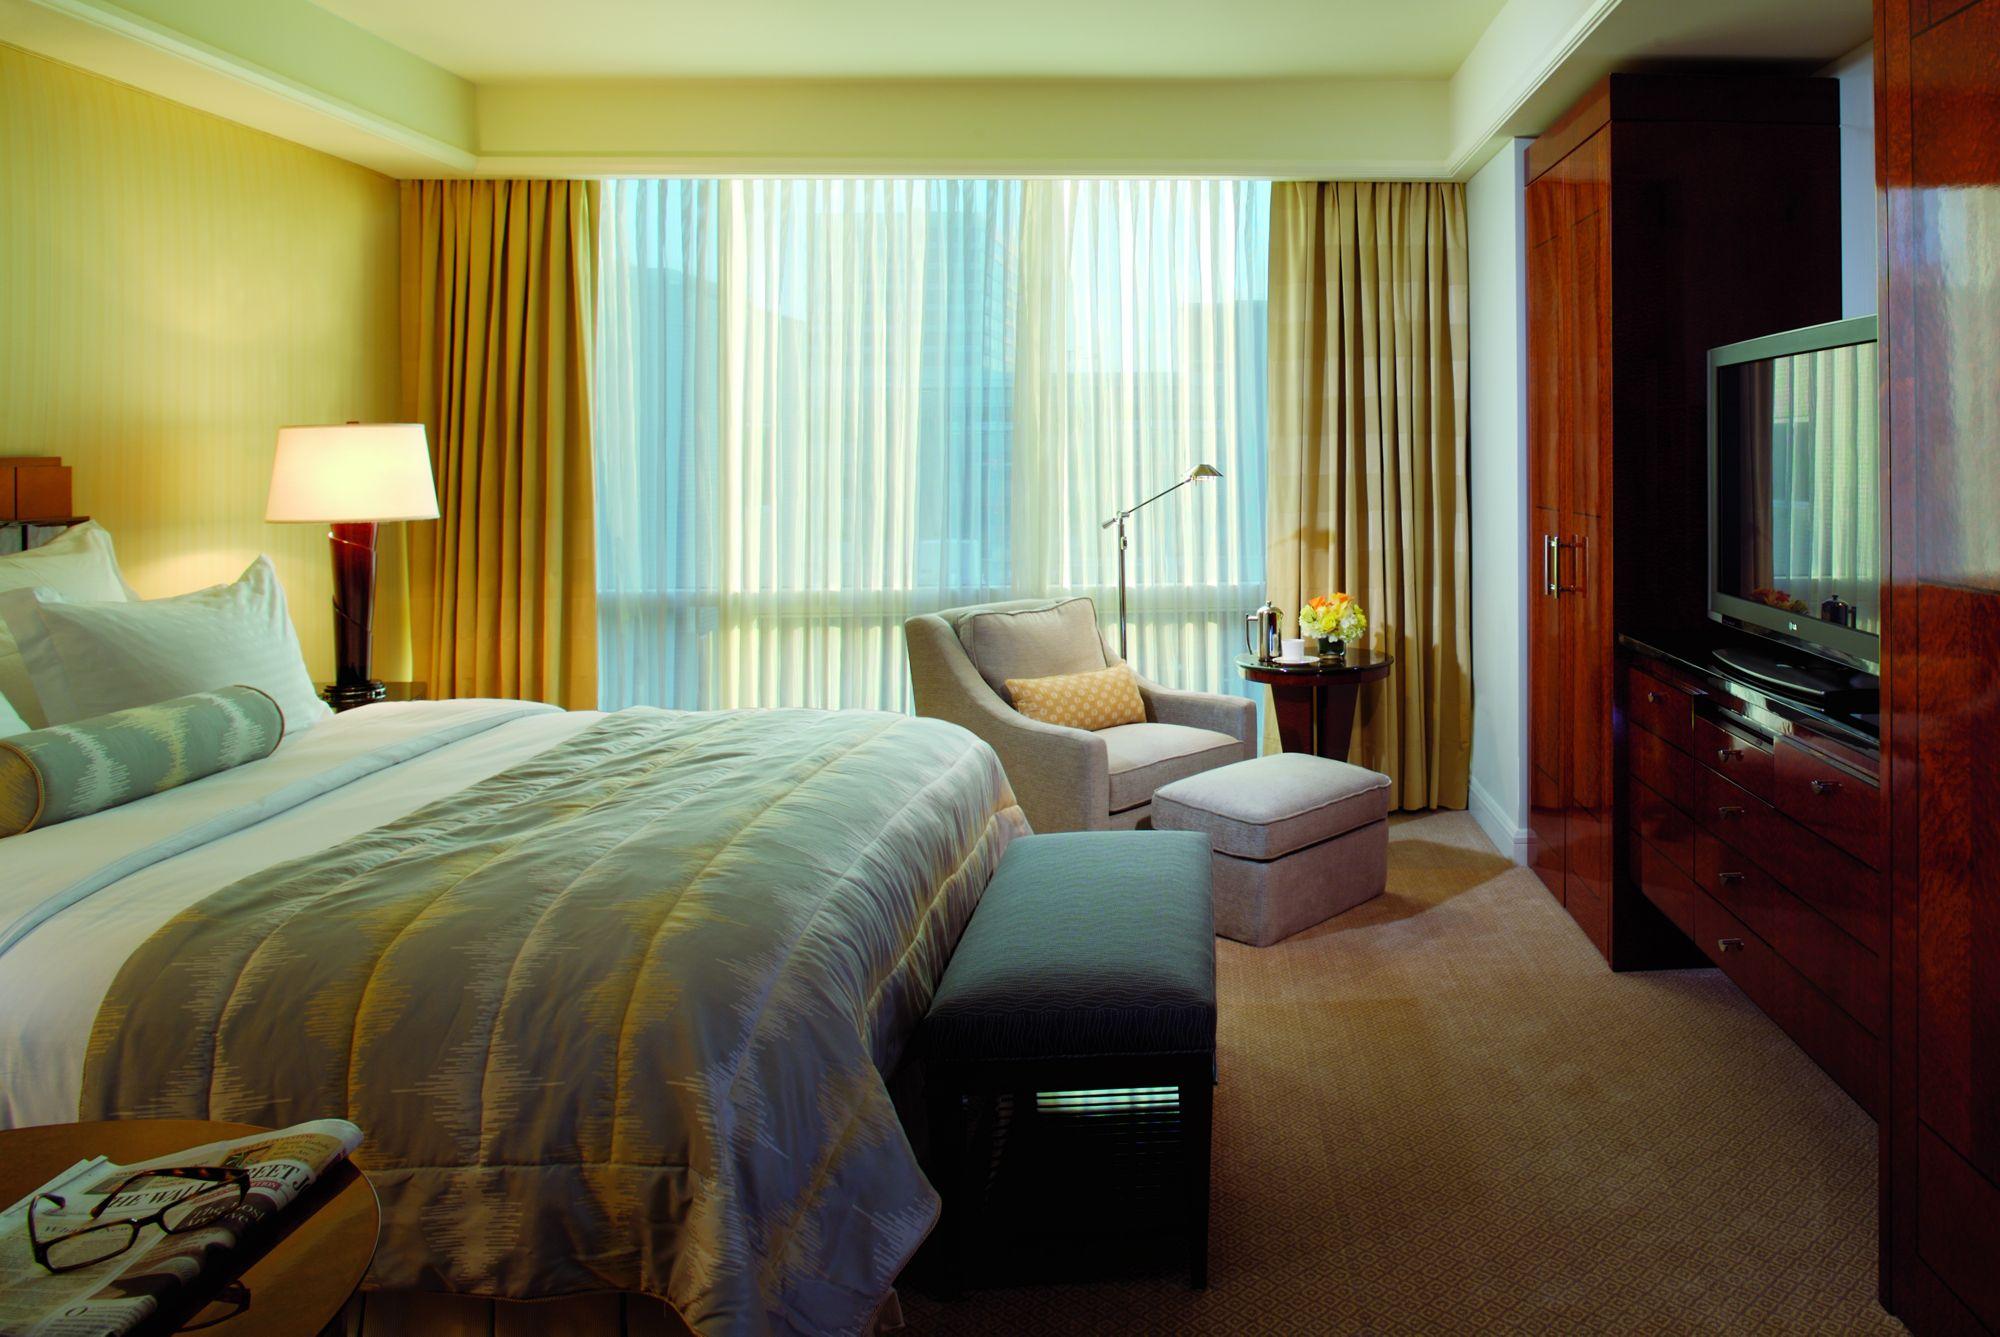 The Ritz-Carlton New York, Westchester image 7